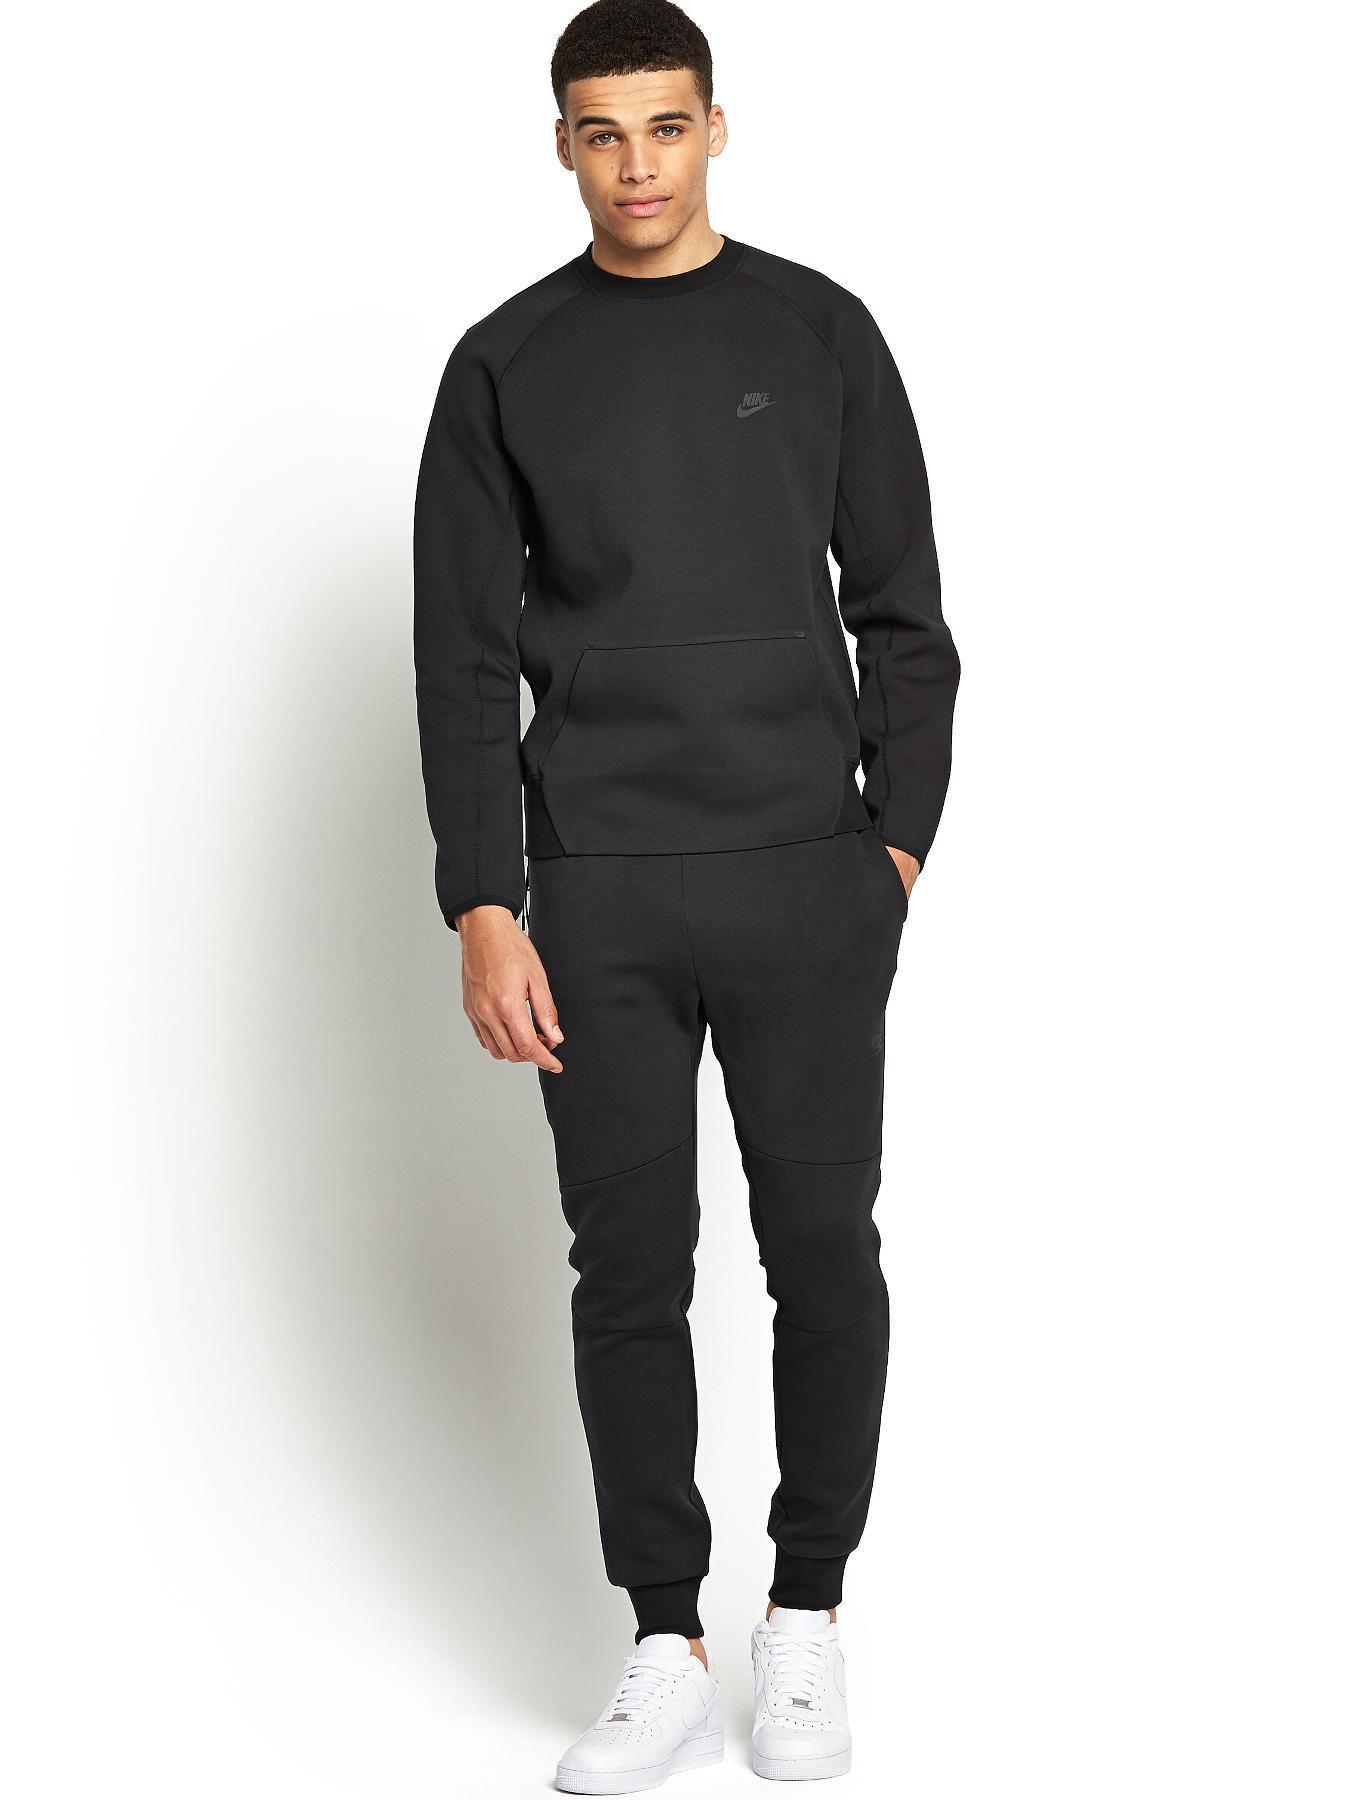 nike-black-mens-tech-fleece-crew-neck-sweatshirt-black-product-1